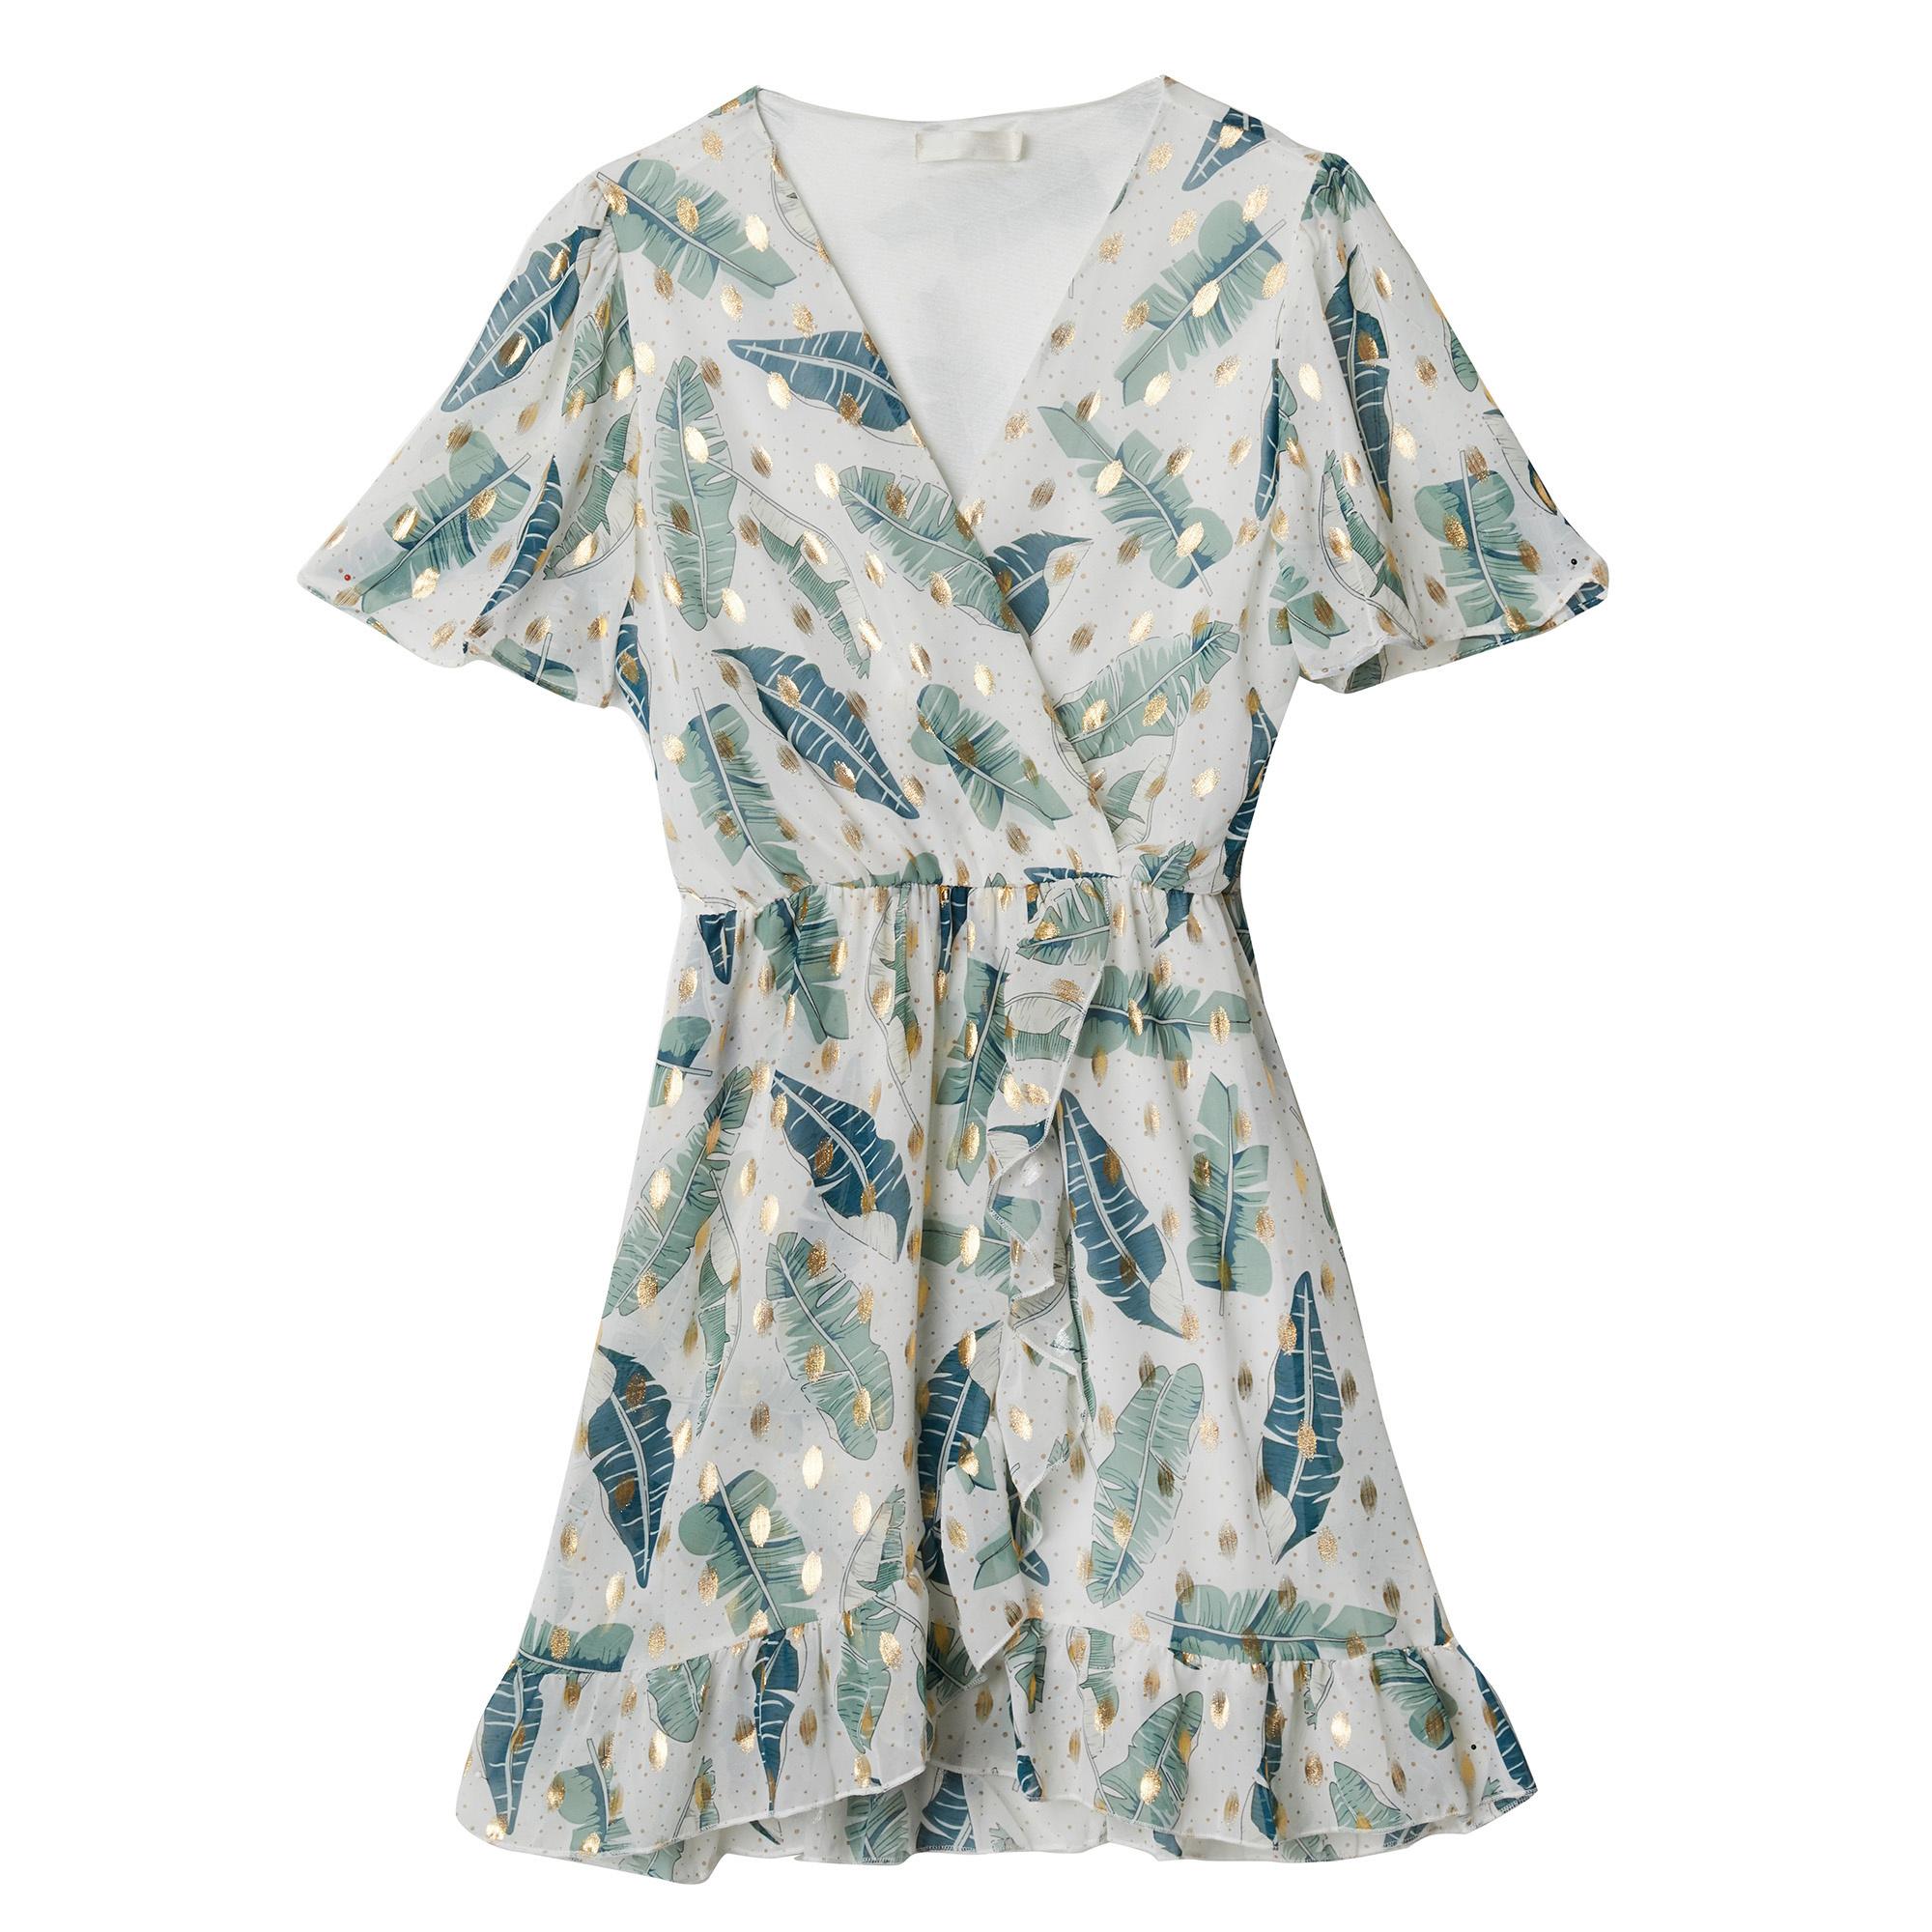 YW Axelle Summer Dress Leaves White